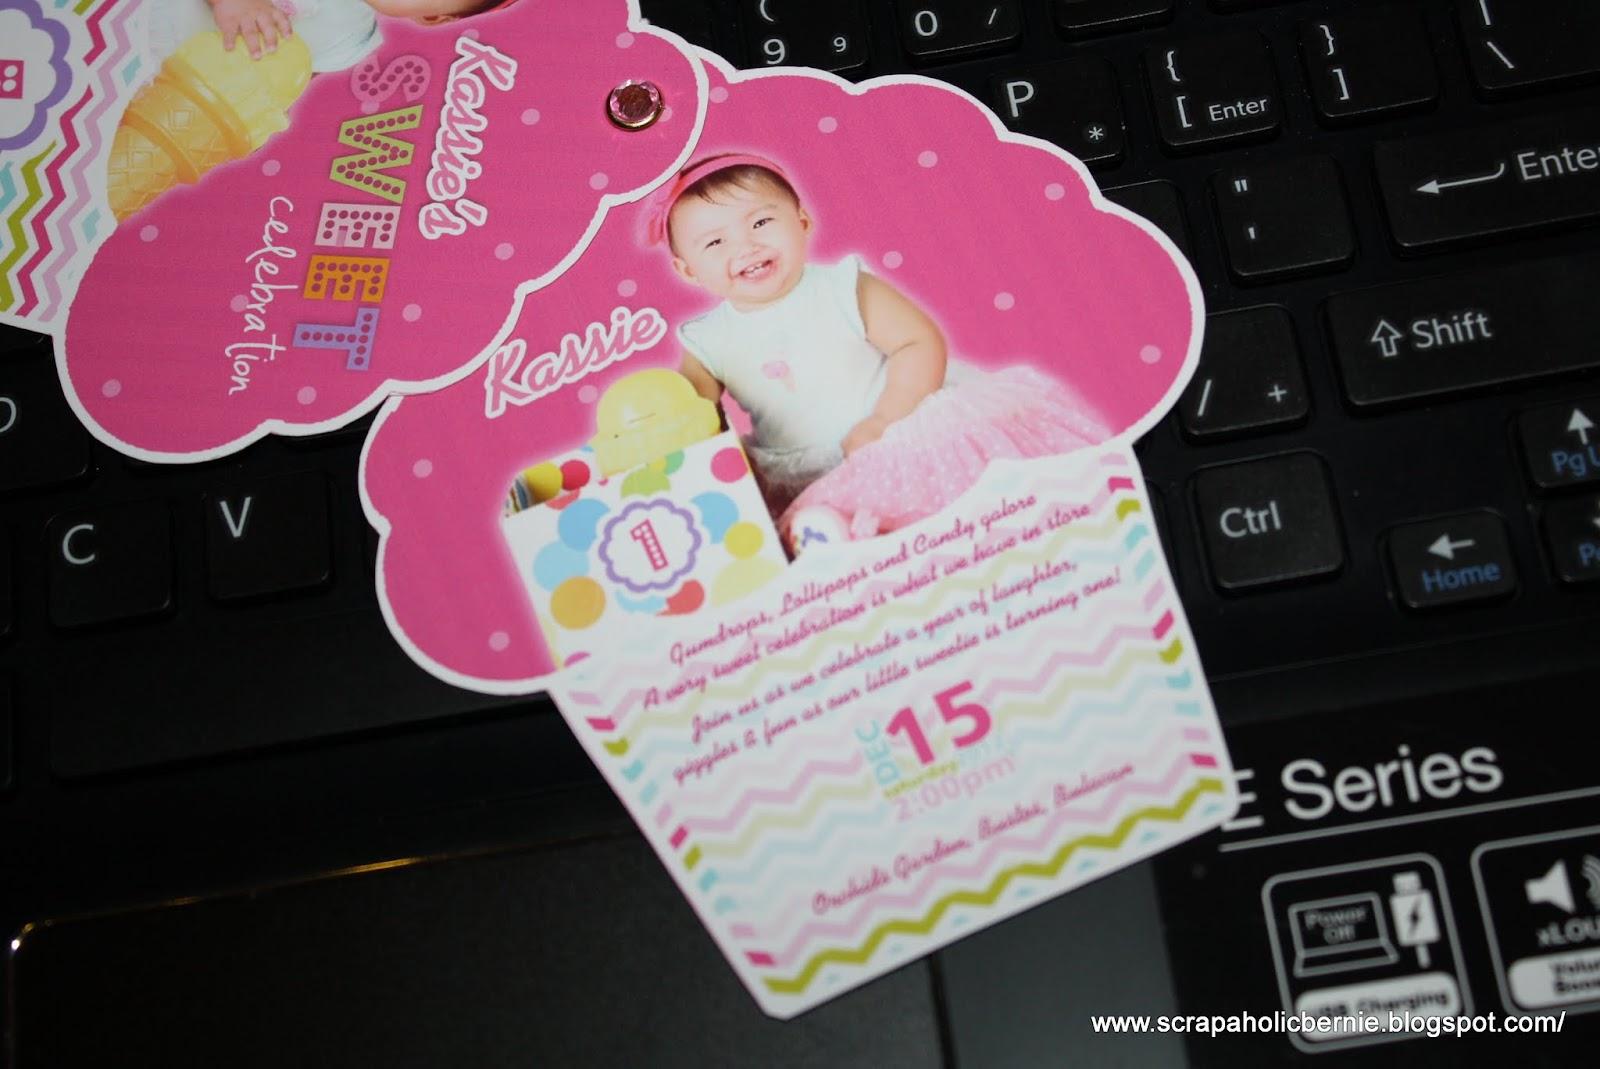 F1 Digital Scrapaholic: Cute Cupcake Birthday Invites